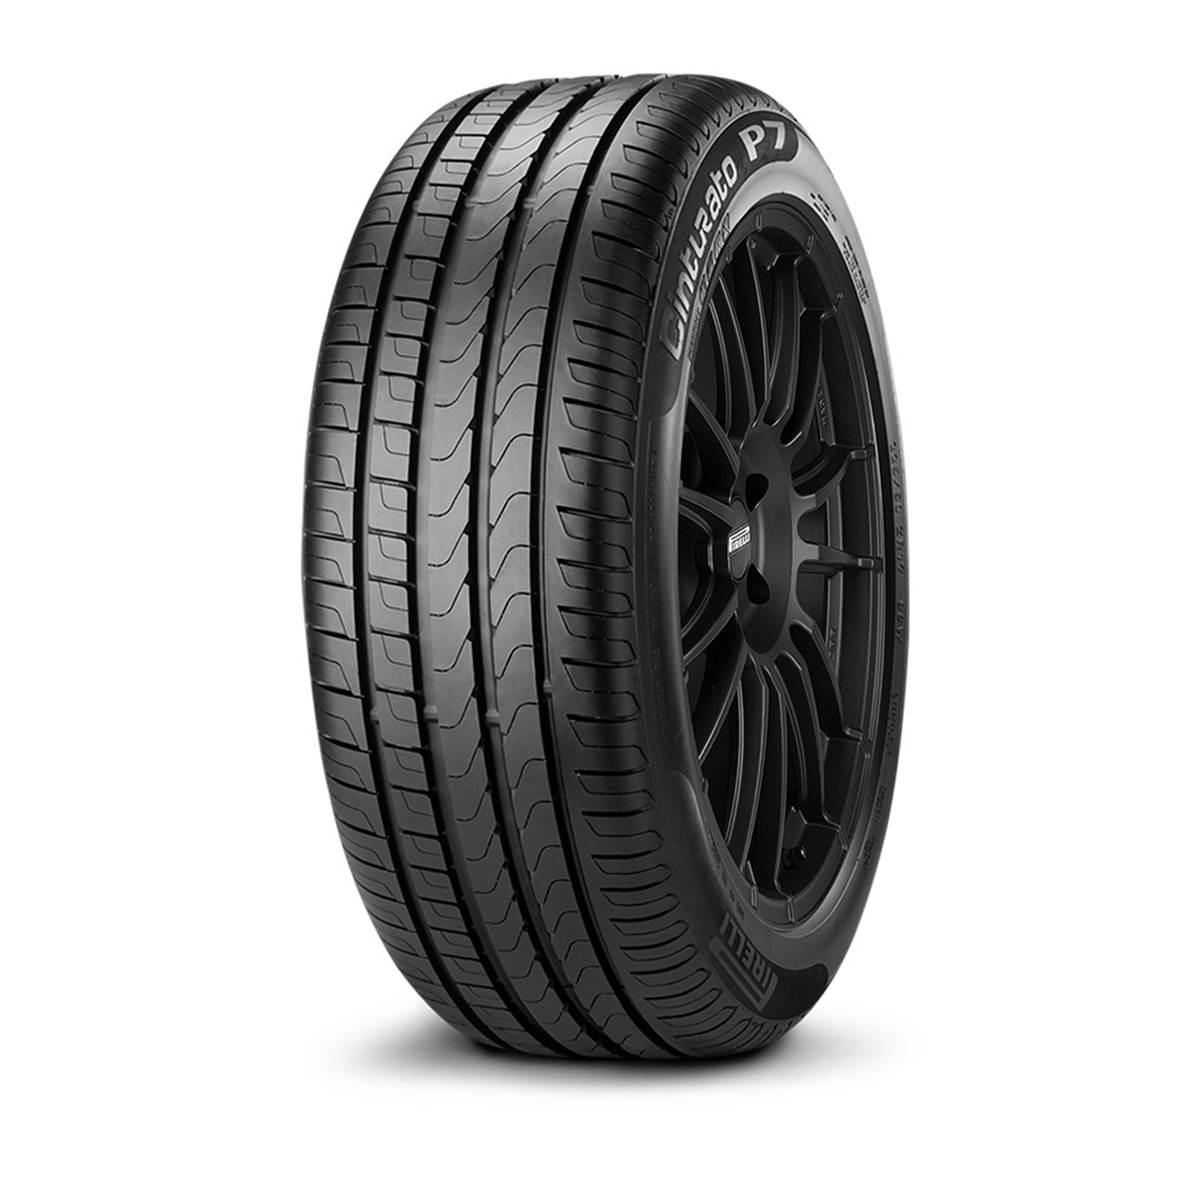 Pneu Pirelli 215/50R17 95W Cinturato P7 XL